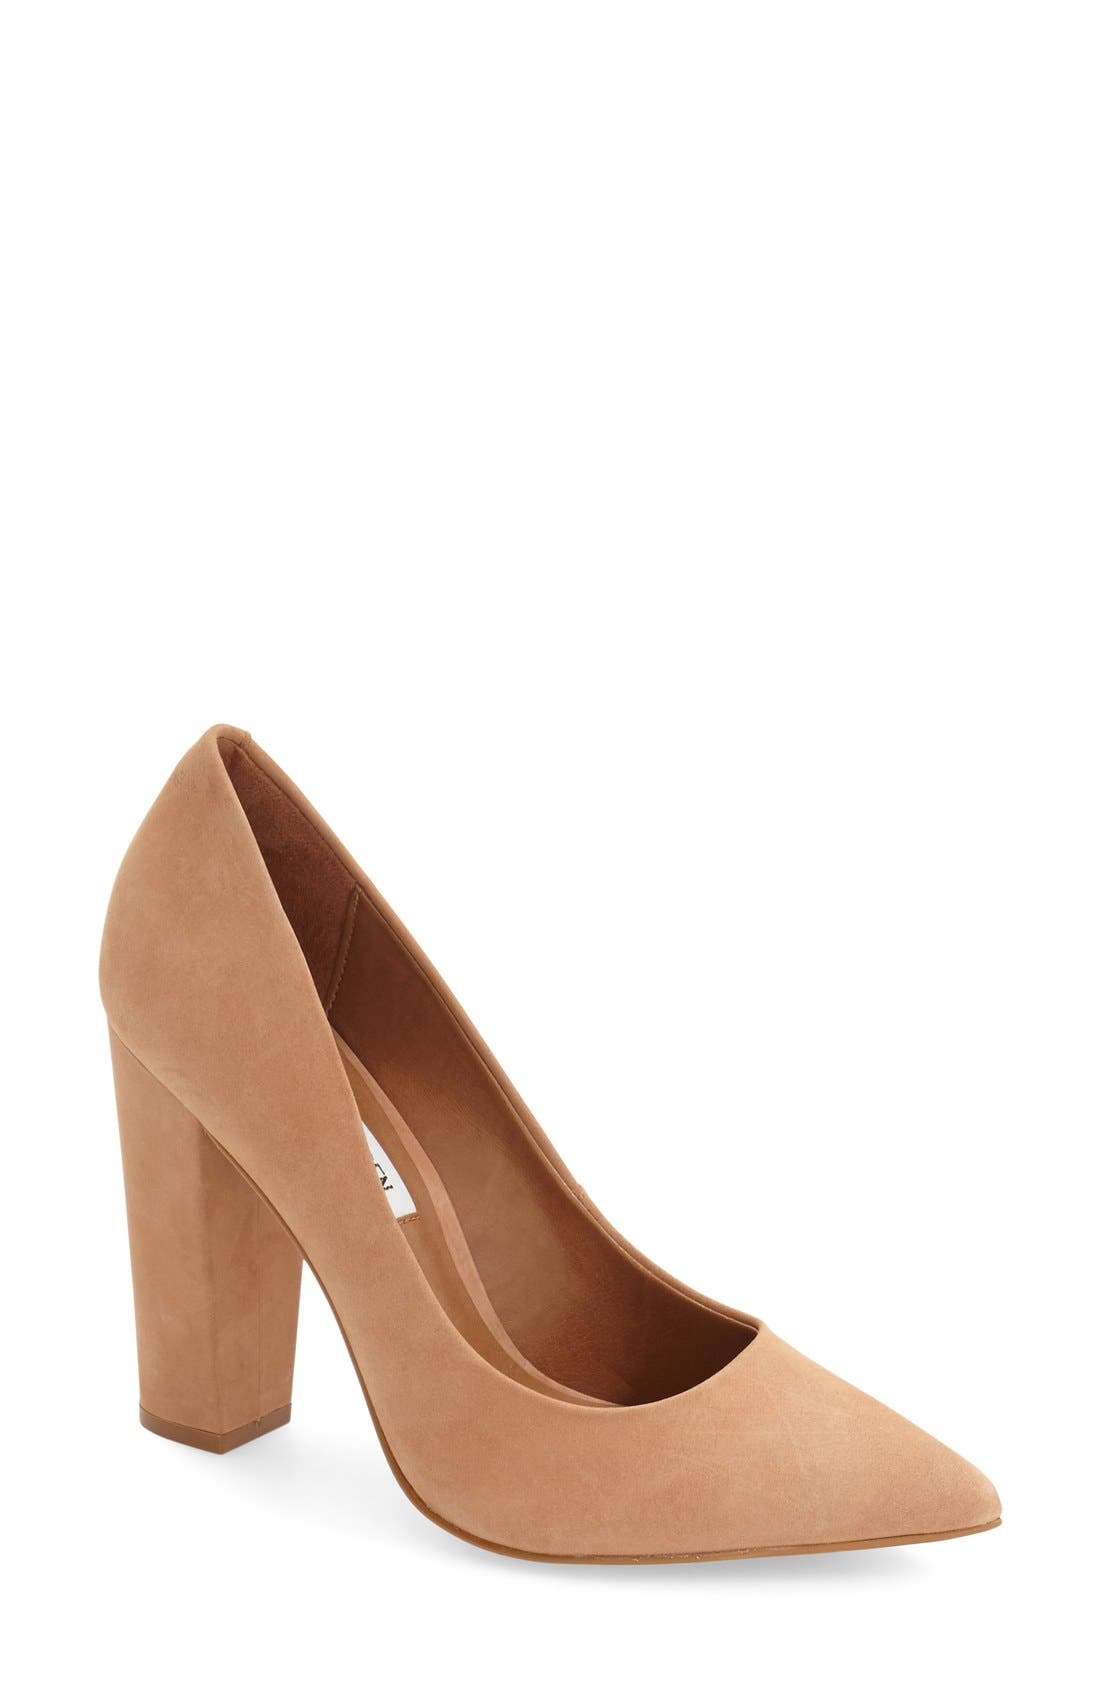 Main Image - Steve Madden 'Primpy' Pointy Toe Block Heel Pump (Women)